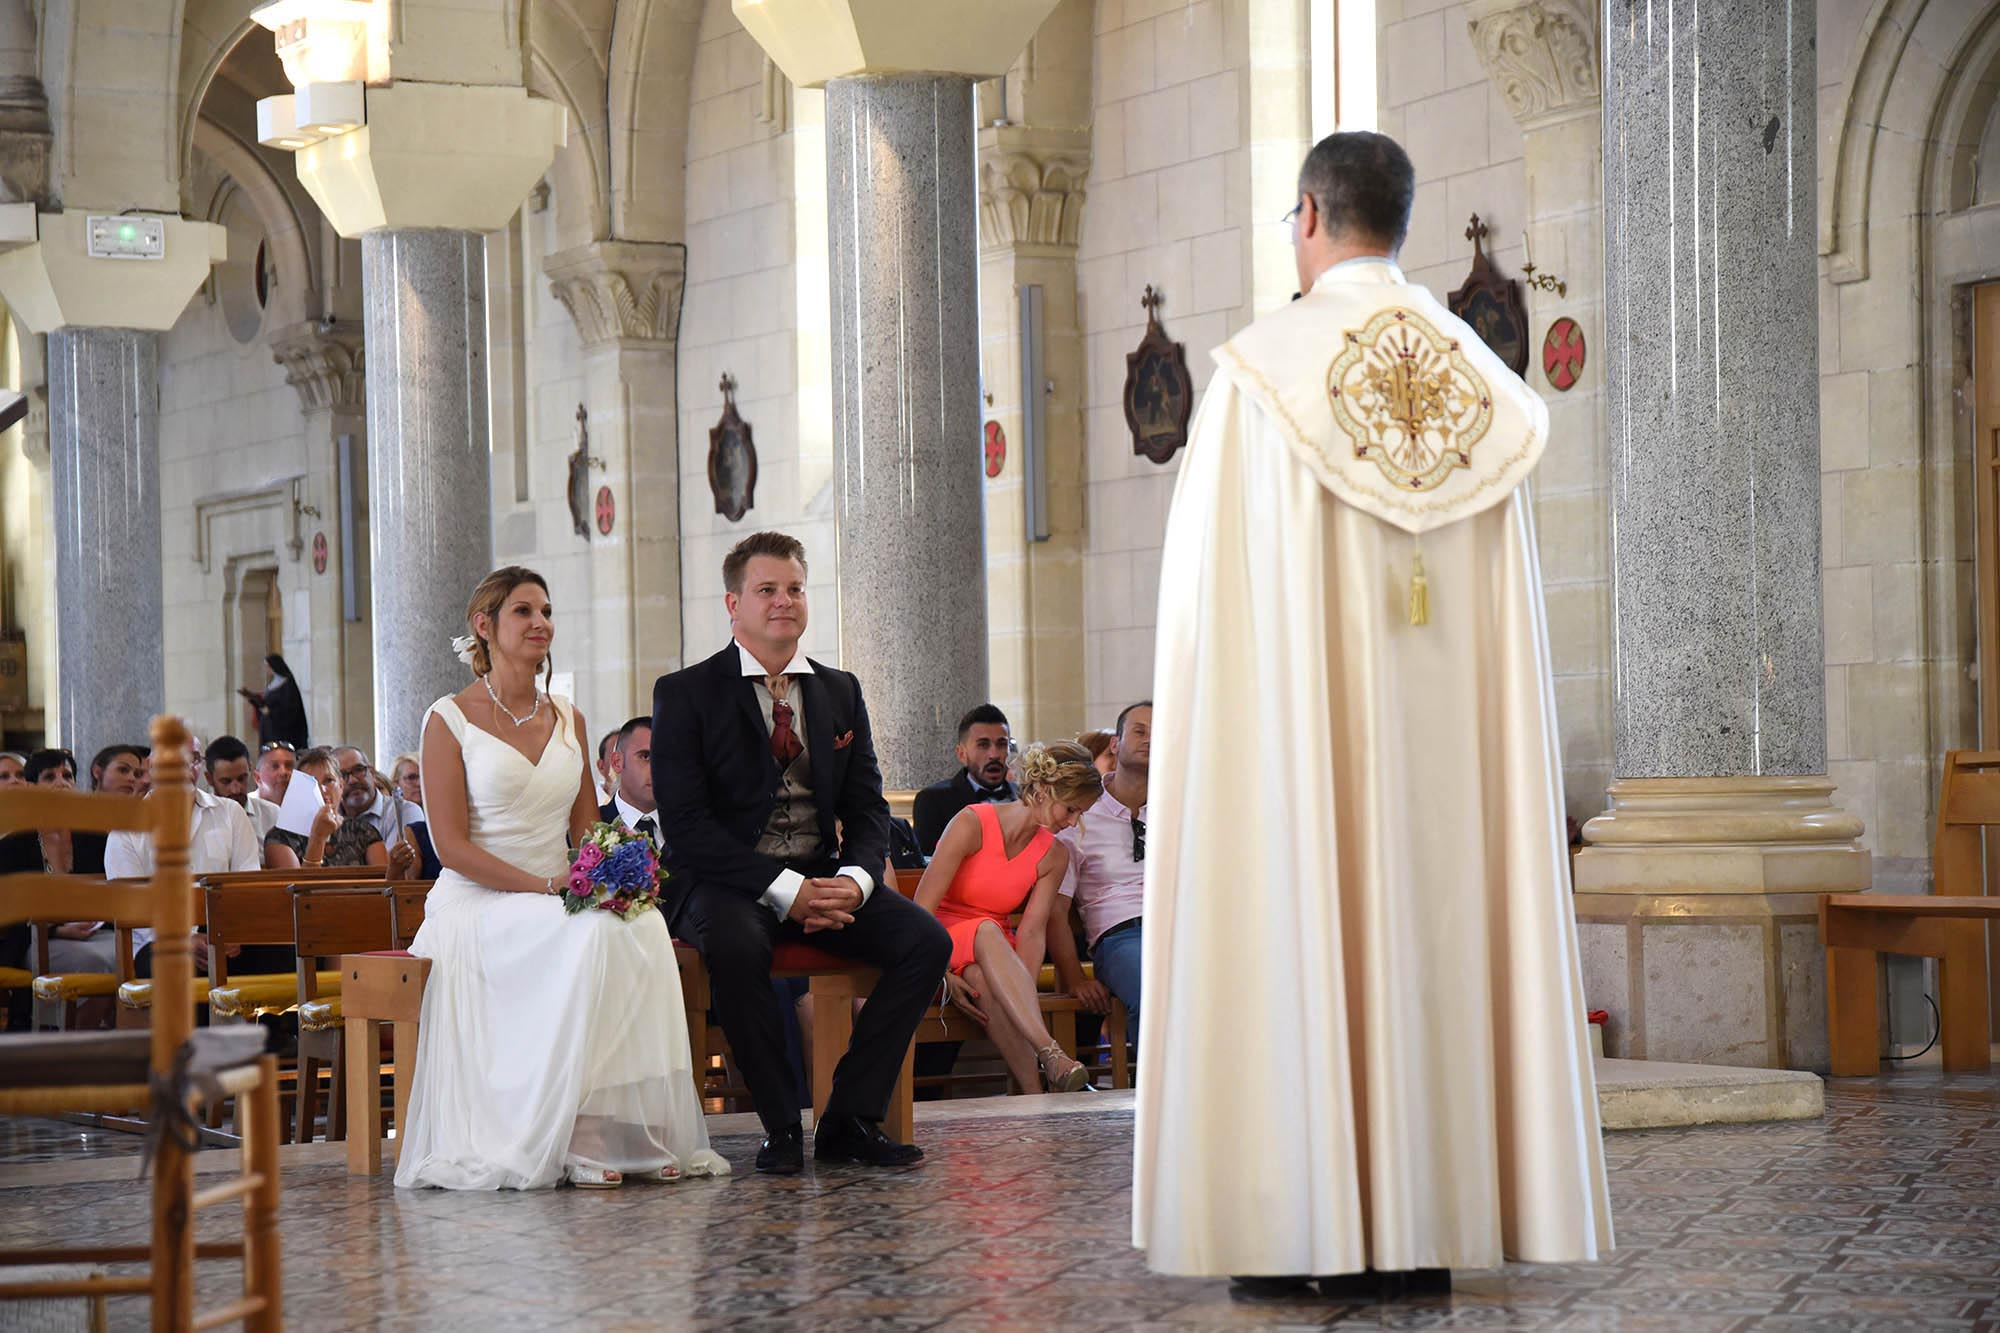 photographe-mariage-ceremonie-bouches-du-rhone